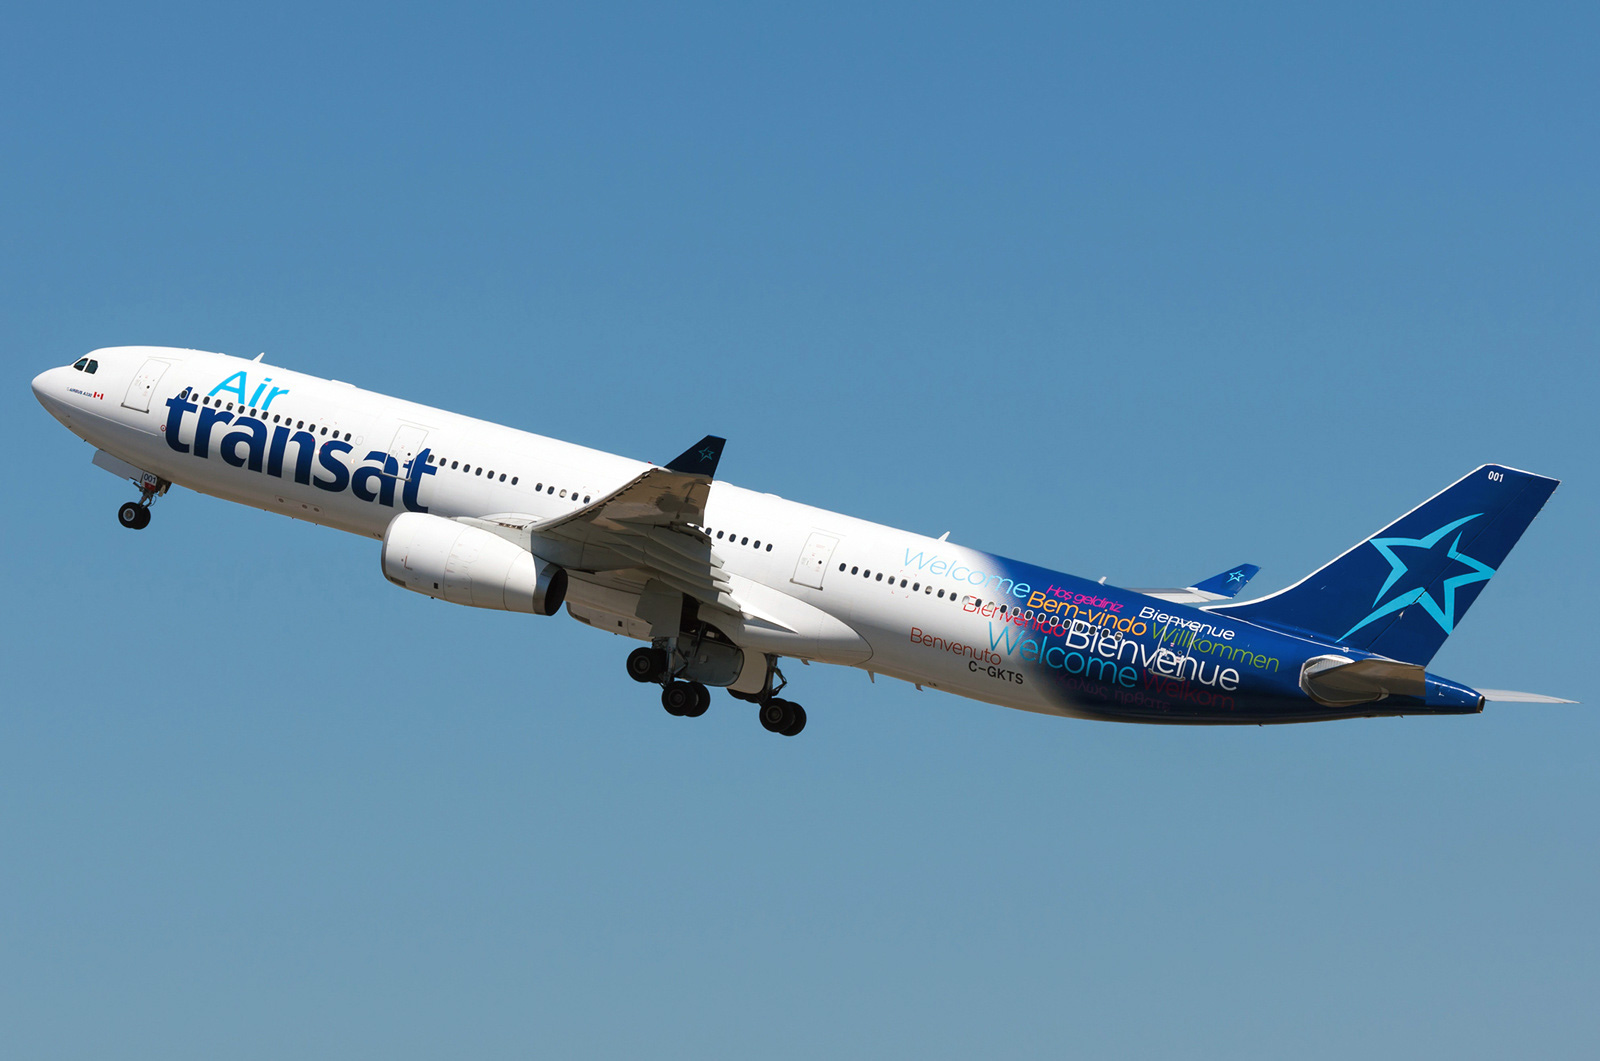 Airbus A330 300 Air Transat Photos And Description Of The Plane